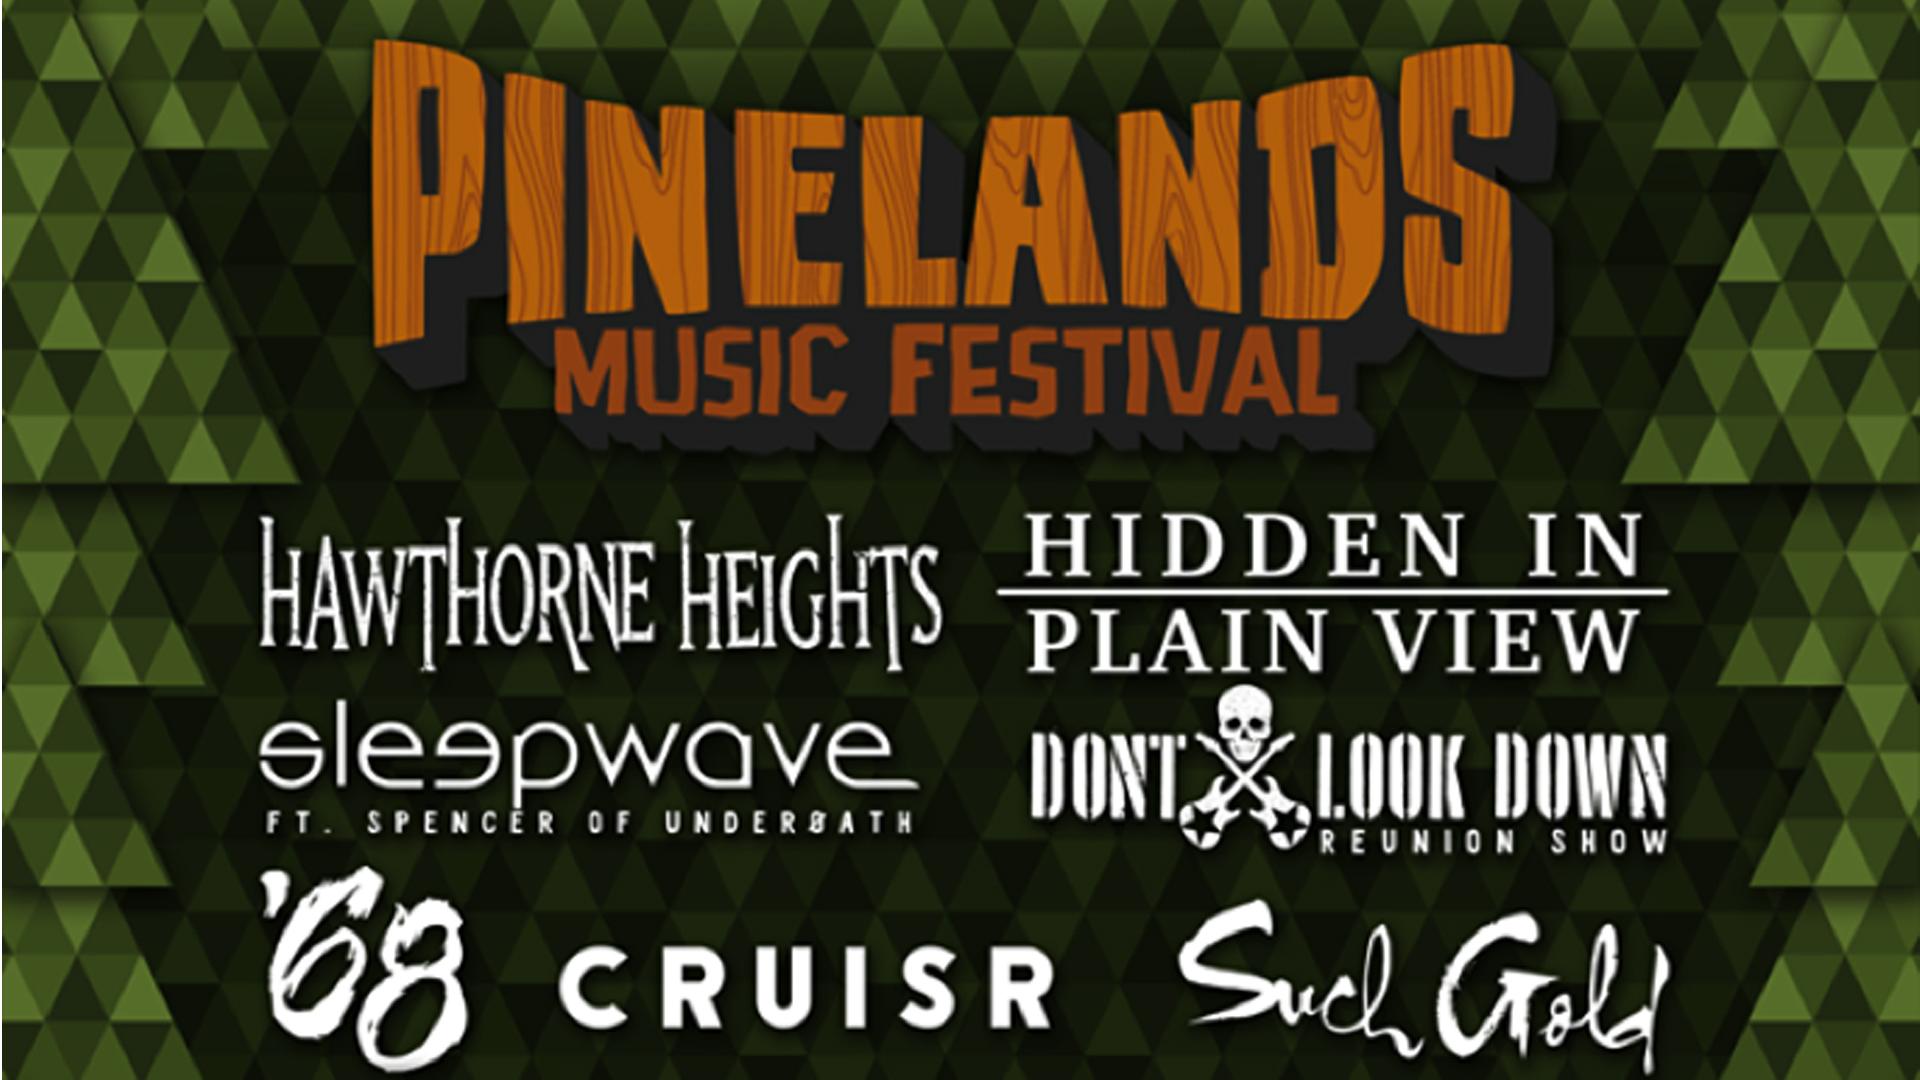 Pinelands Music Festival 2016 (Oct. 9, 2016)   Alternative Rock, Post Punk, Post Rock, Indie Pop  Millville, NJ  Posted Sept. 15th, 2016